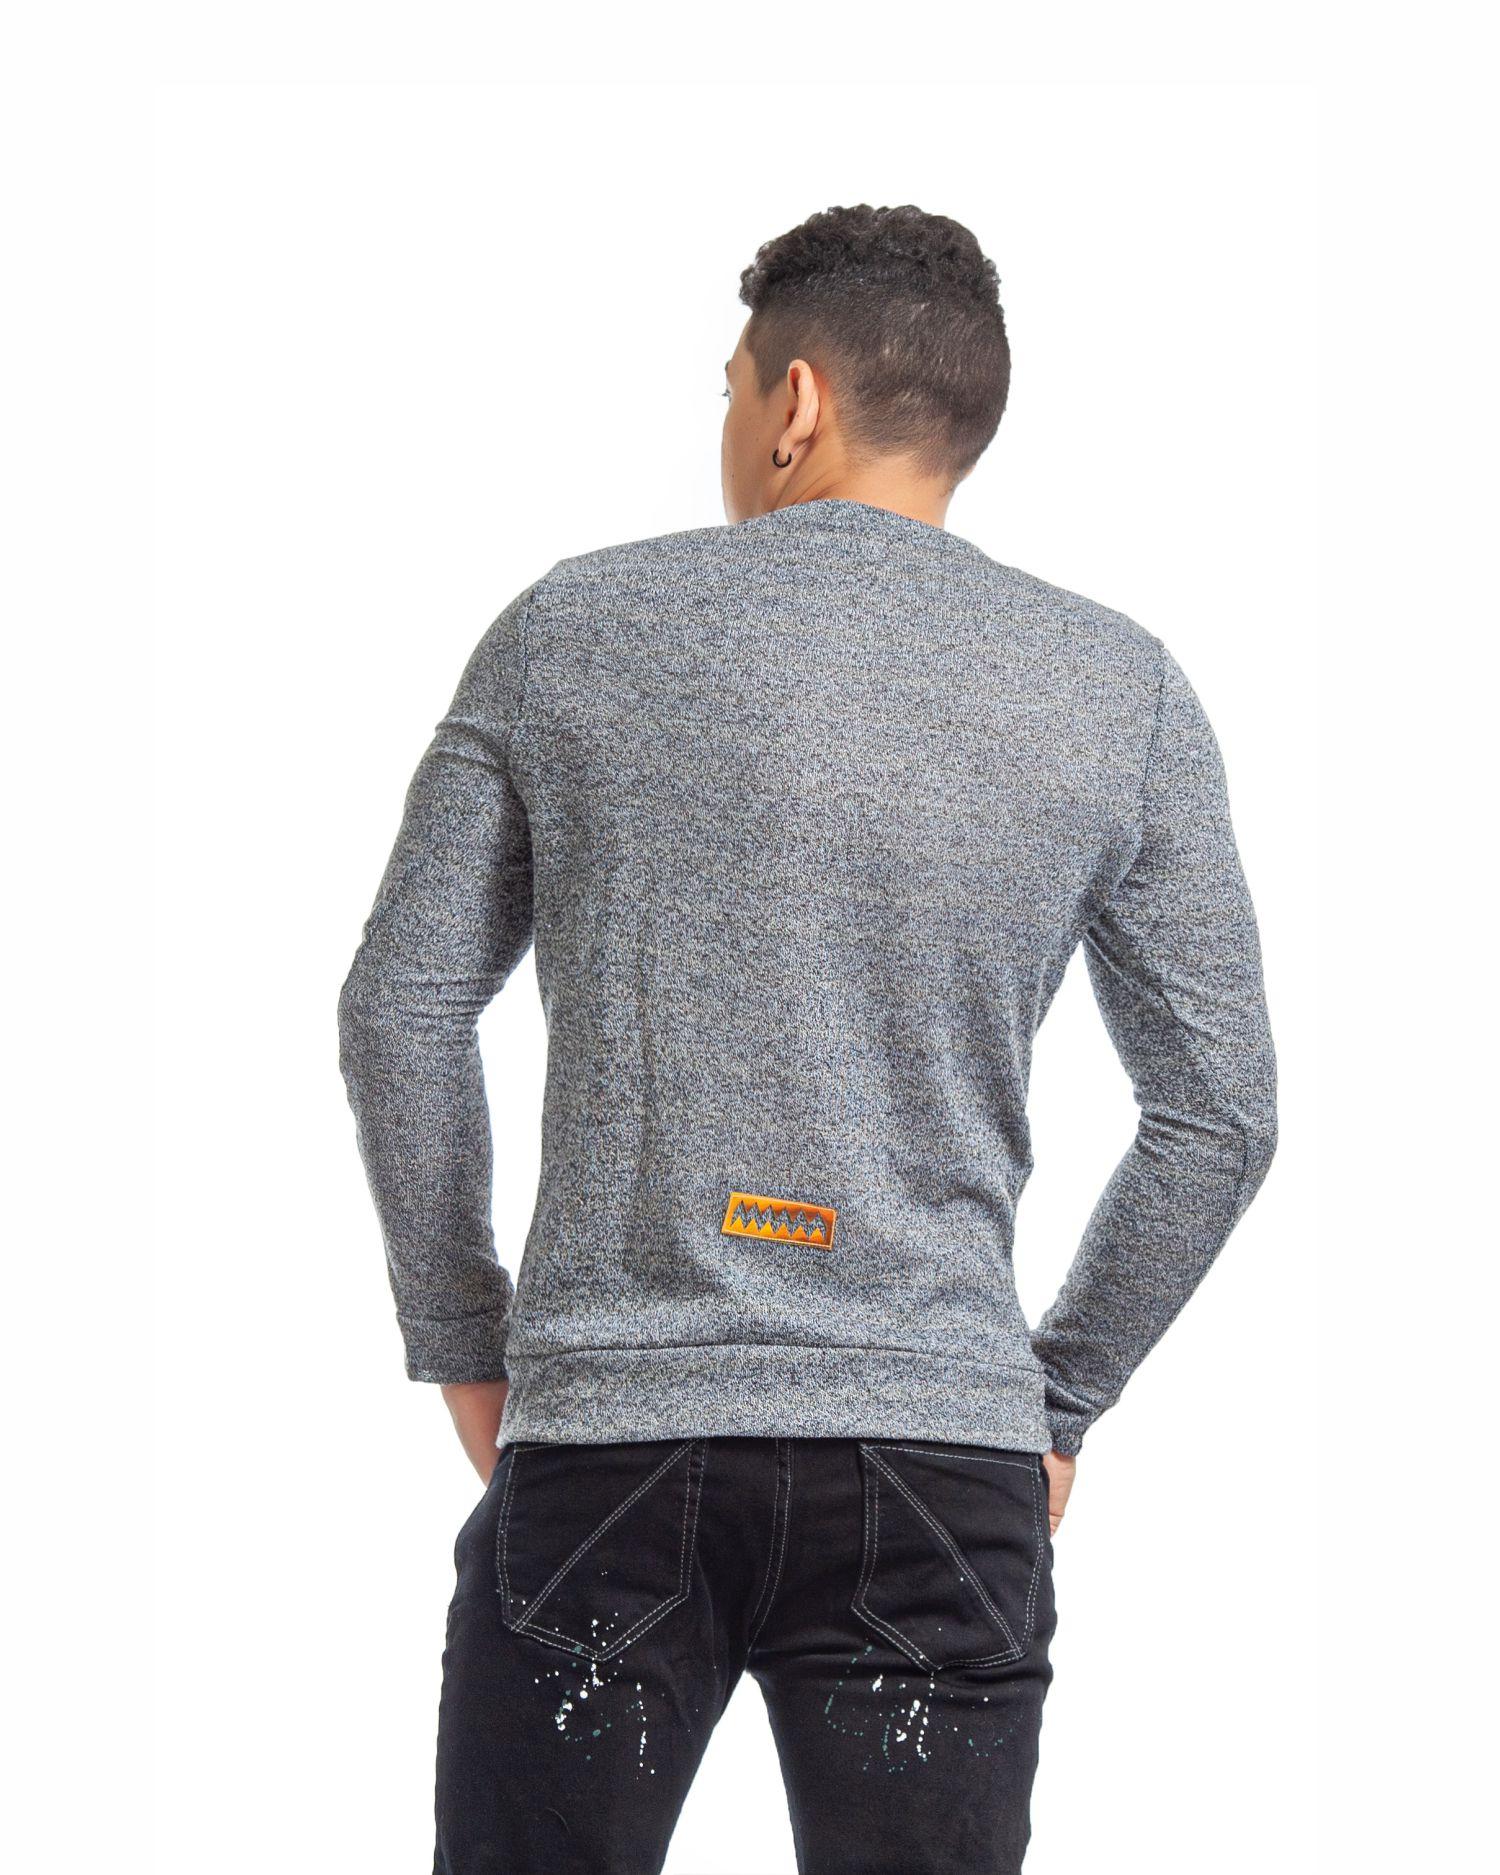 ref 1755 2 buzo gris tejido, tela en algodón 80% + 18% poliéster + 2% Spandex. Tallas S-M-L-XL. $72.000.